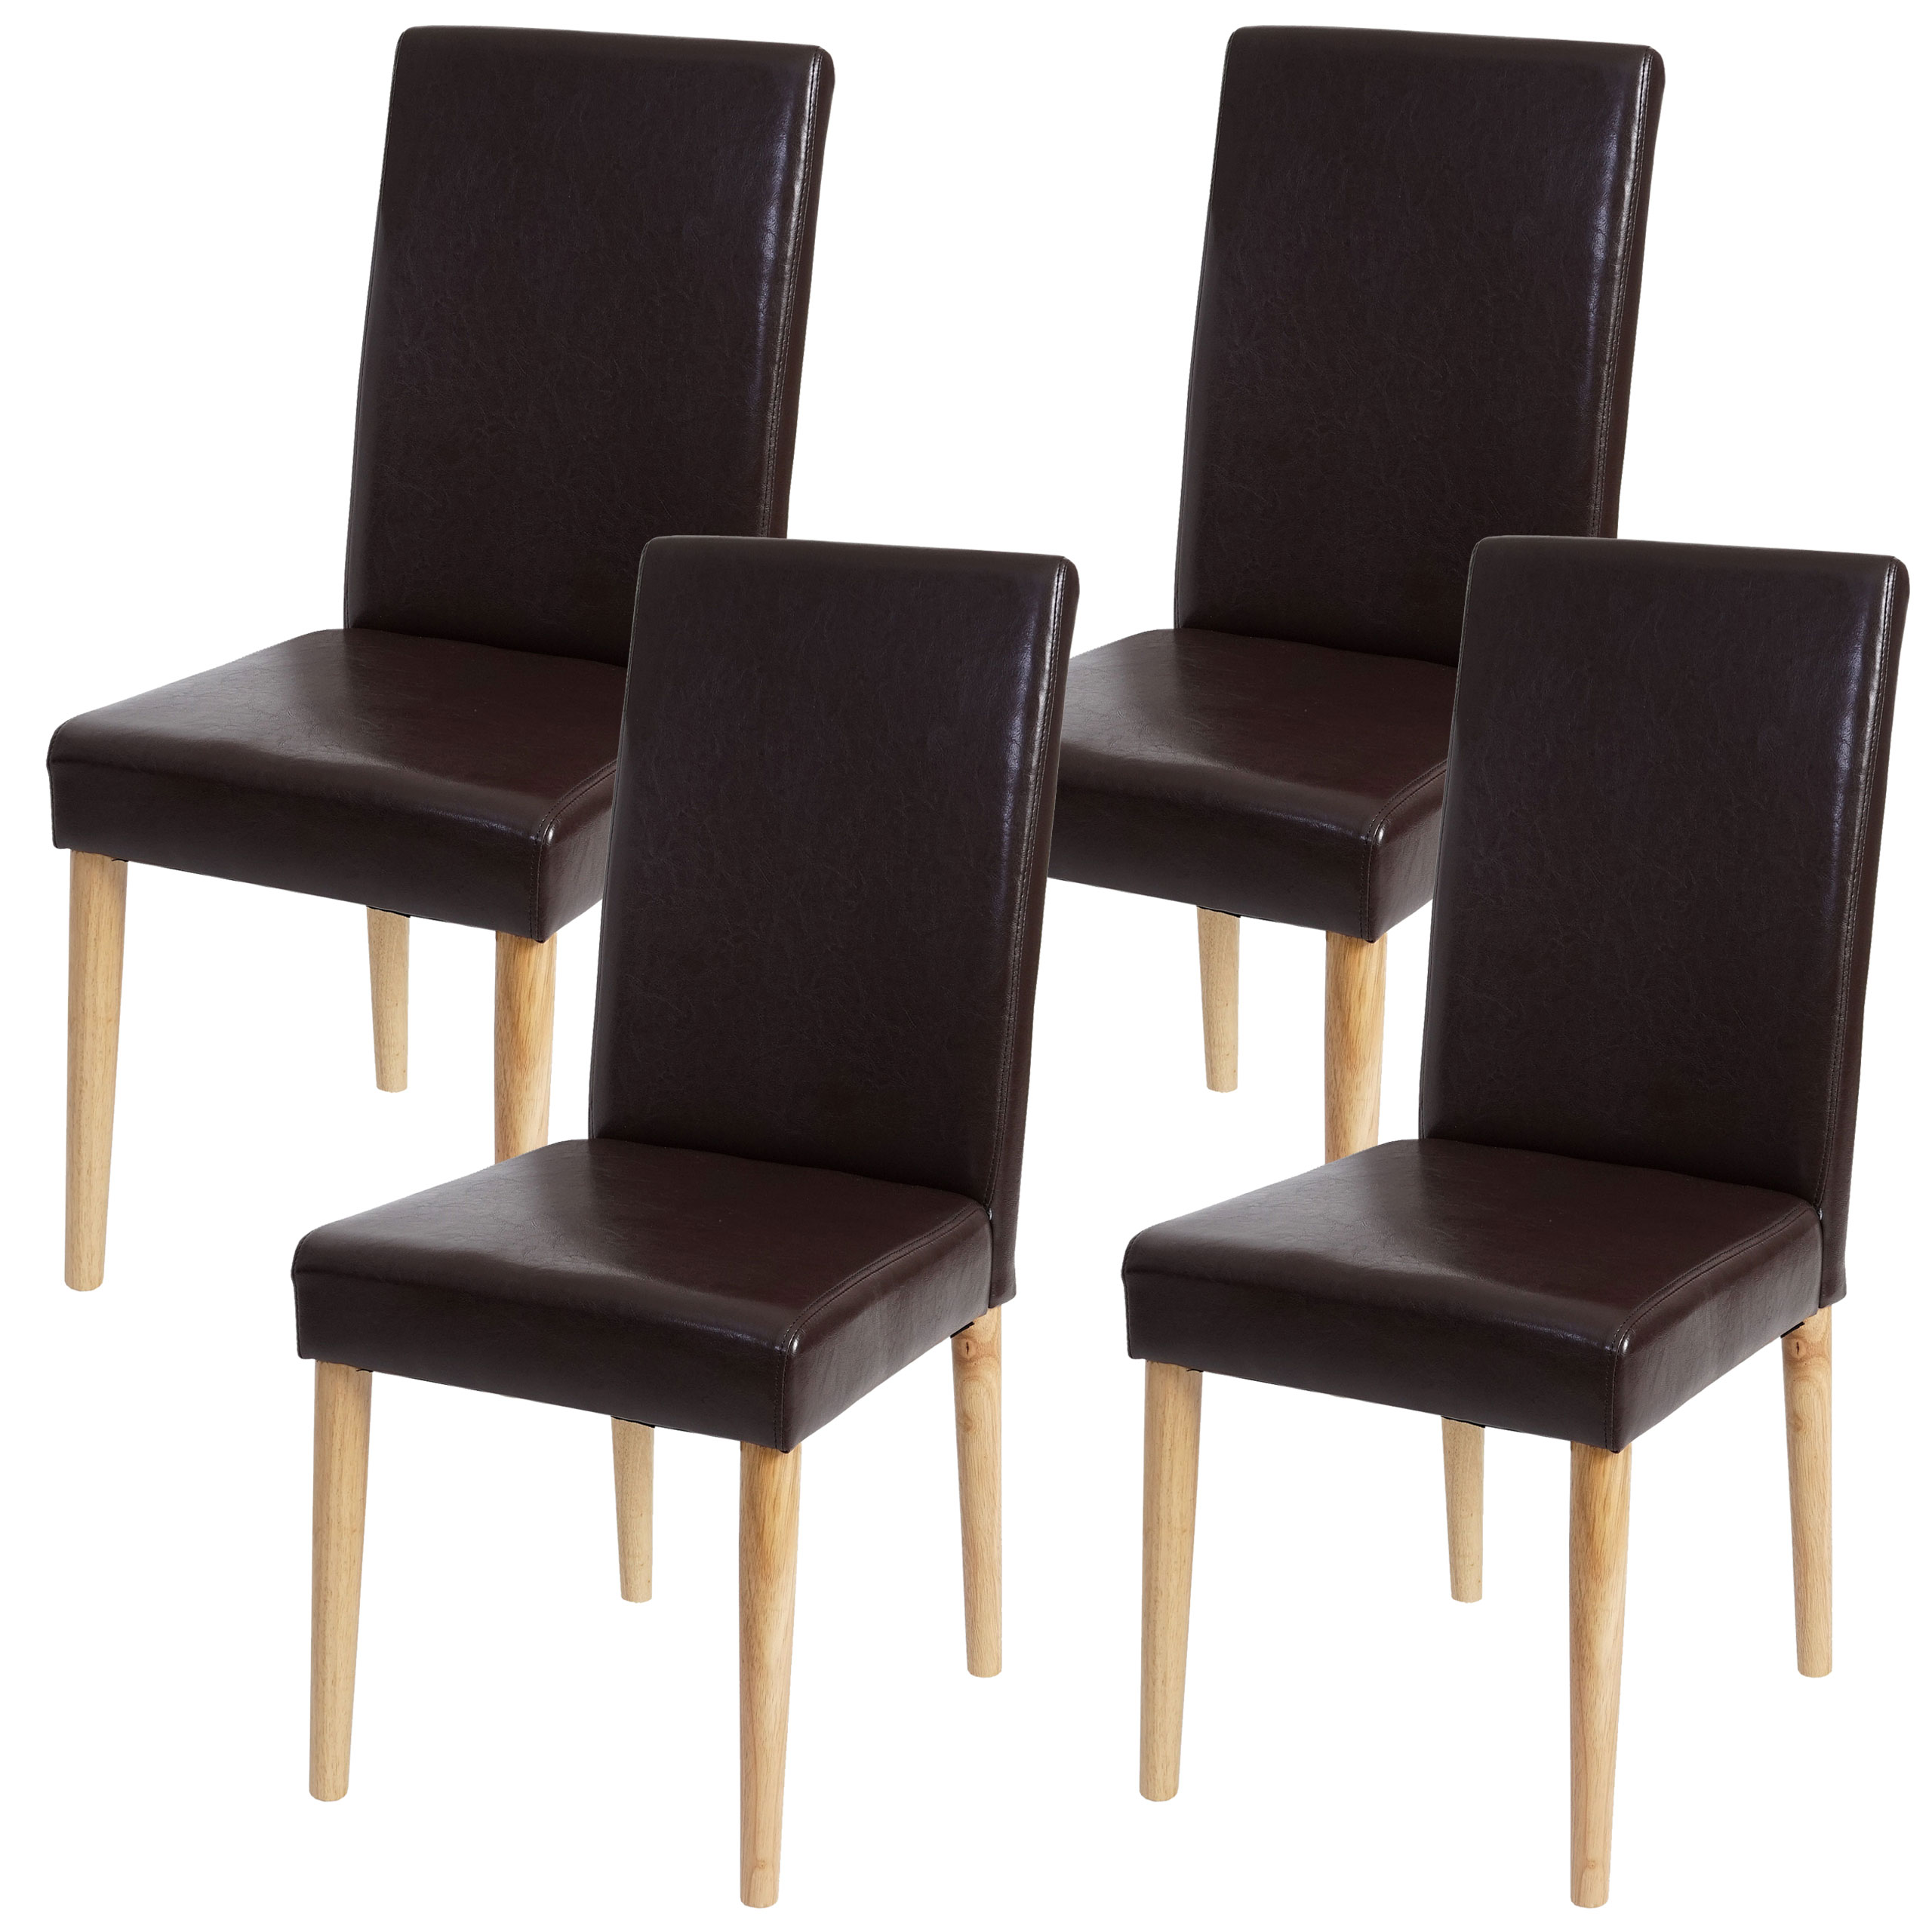 4x esszimmerstuhl leslau stuhl lehnstuhl kunstleder for Stuhl braun kunstleder